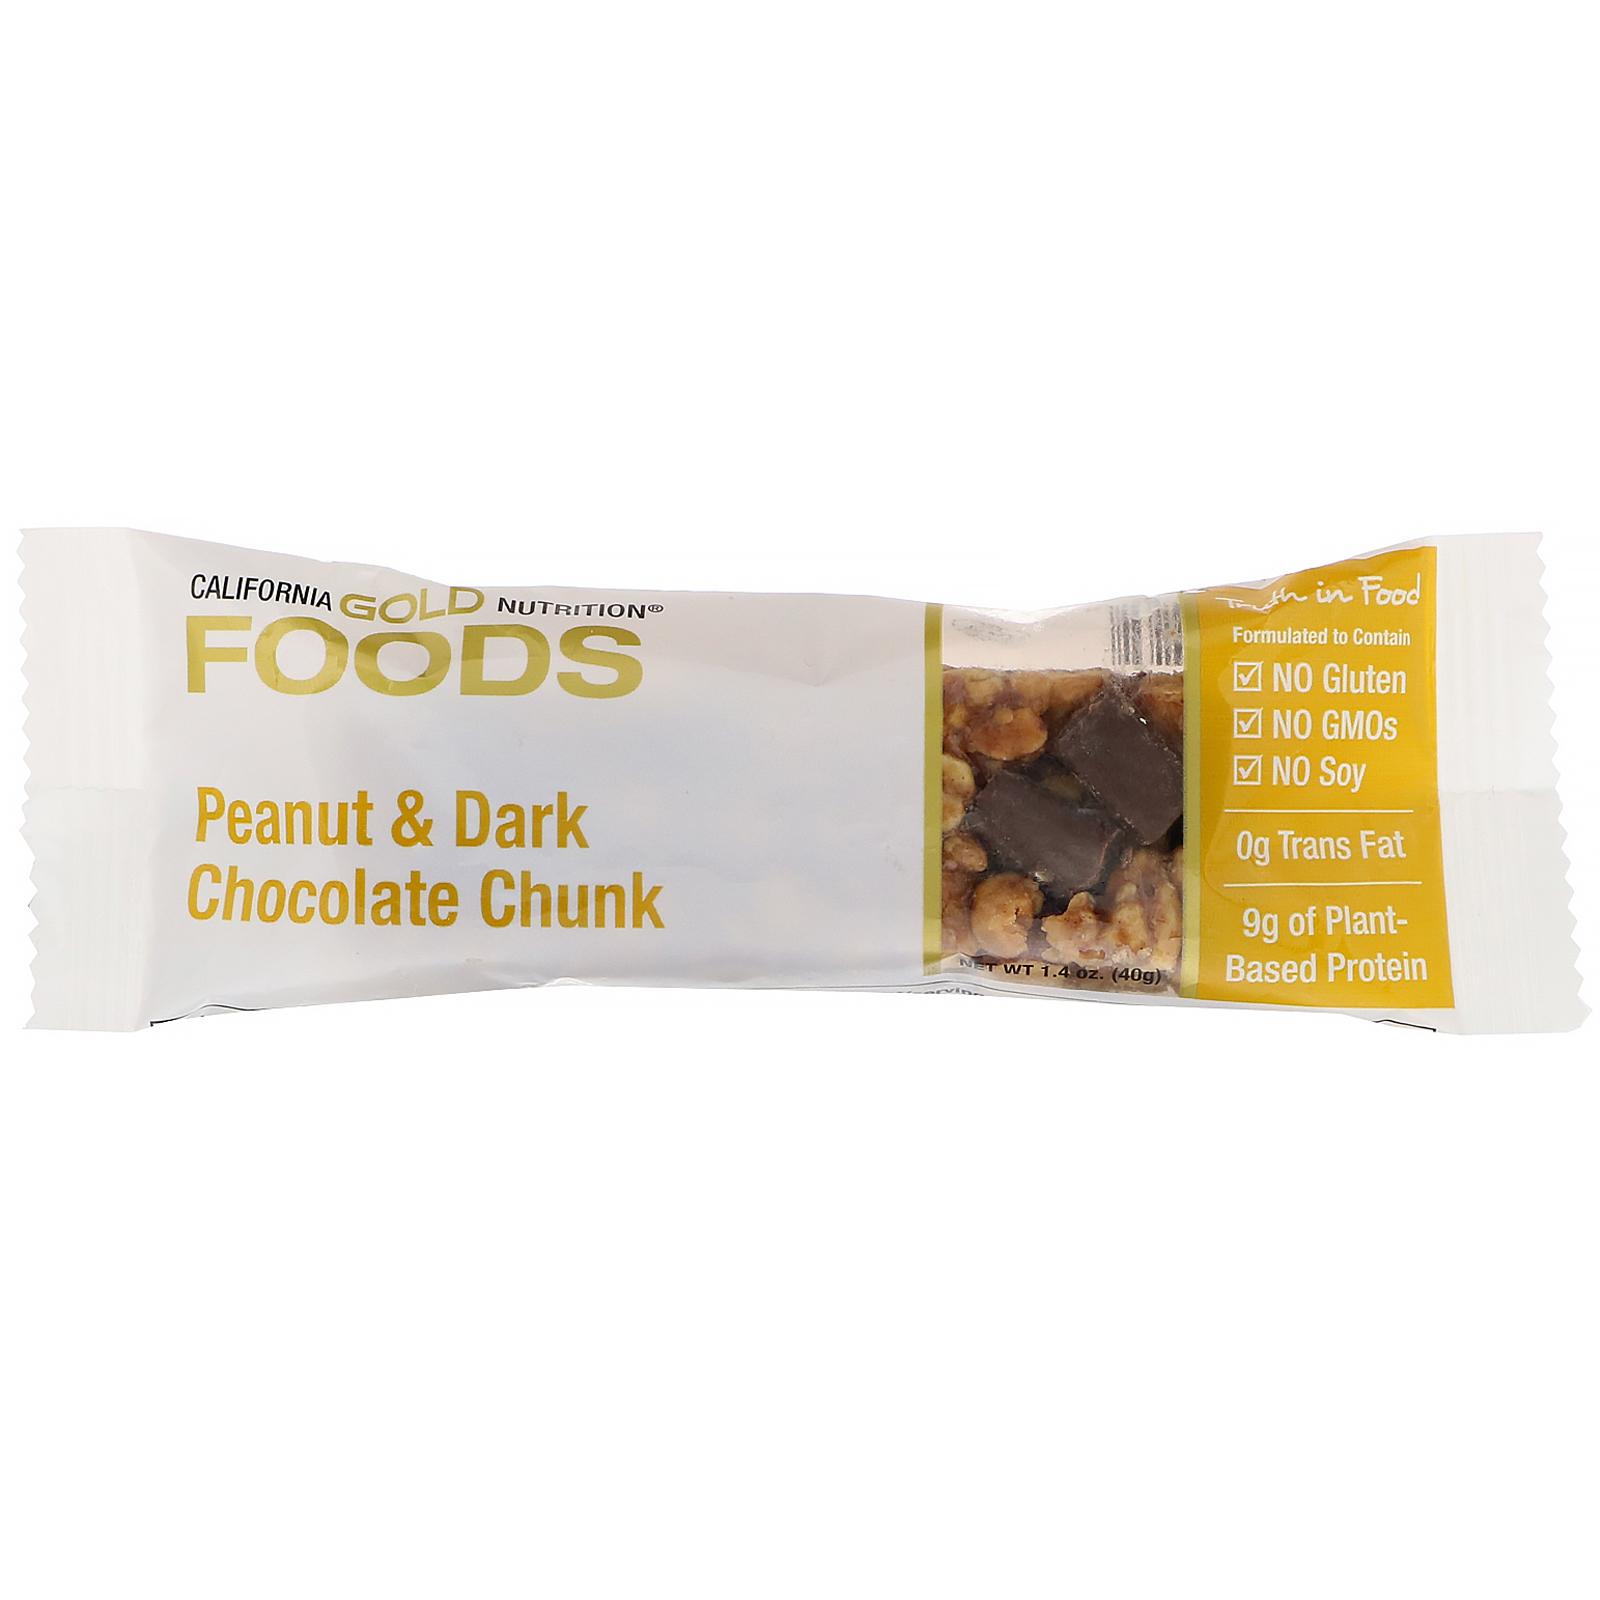 California Gold Nutrition Gold Bar Peanut Dark Chocolate